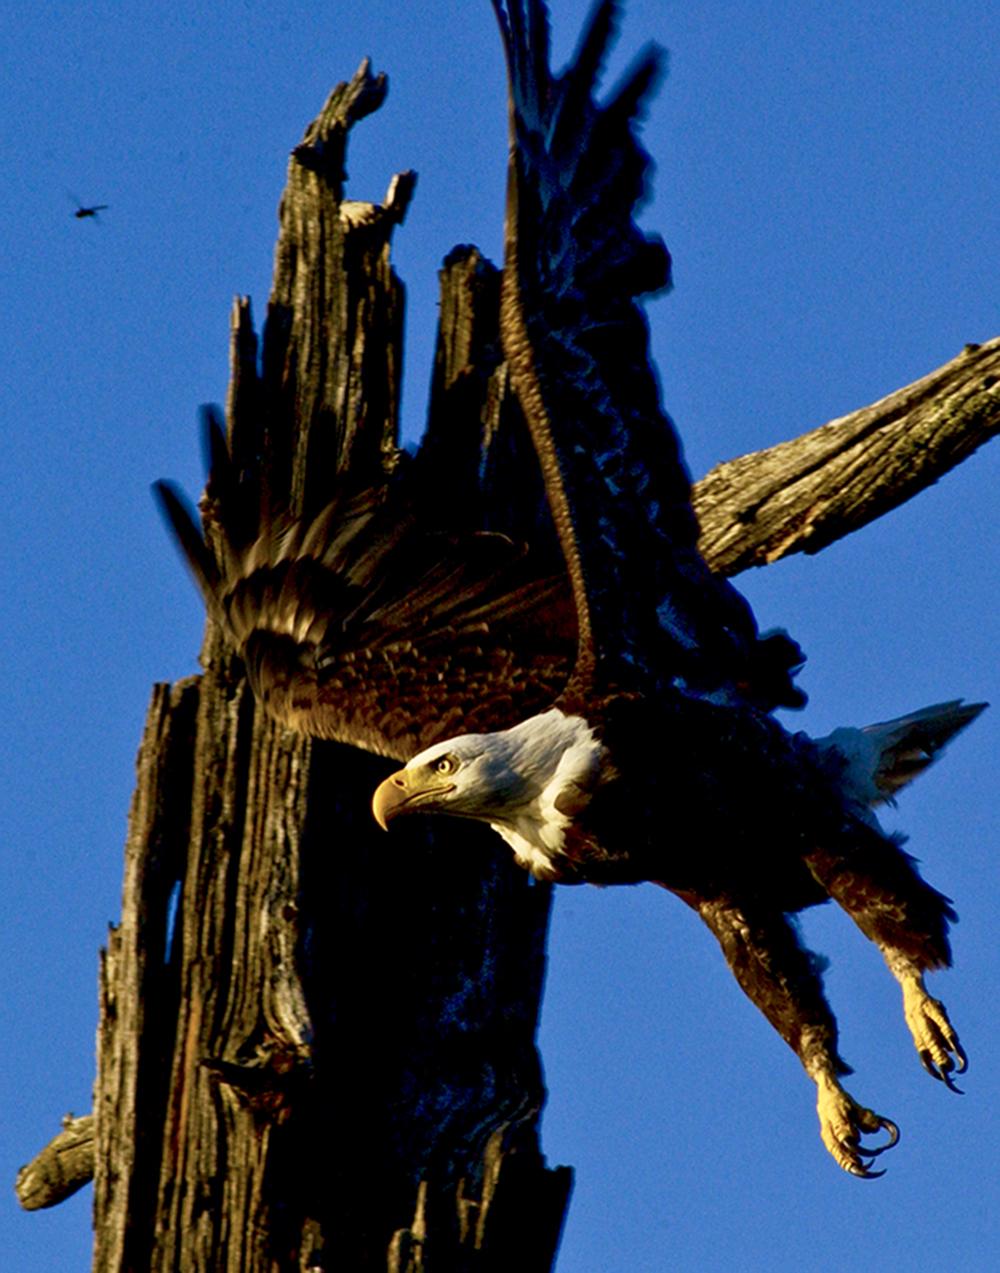 grand teton national park photography guide 2 image